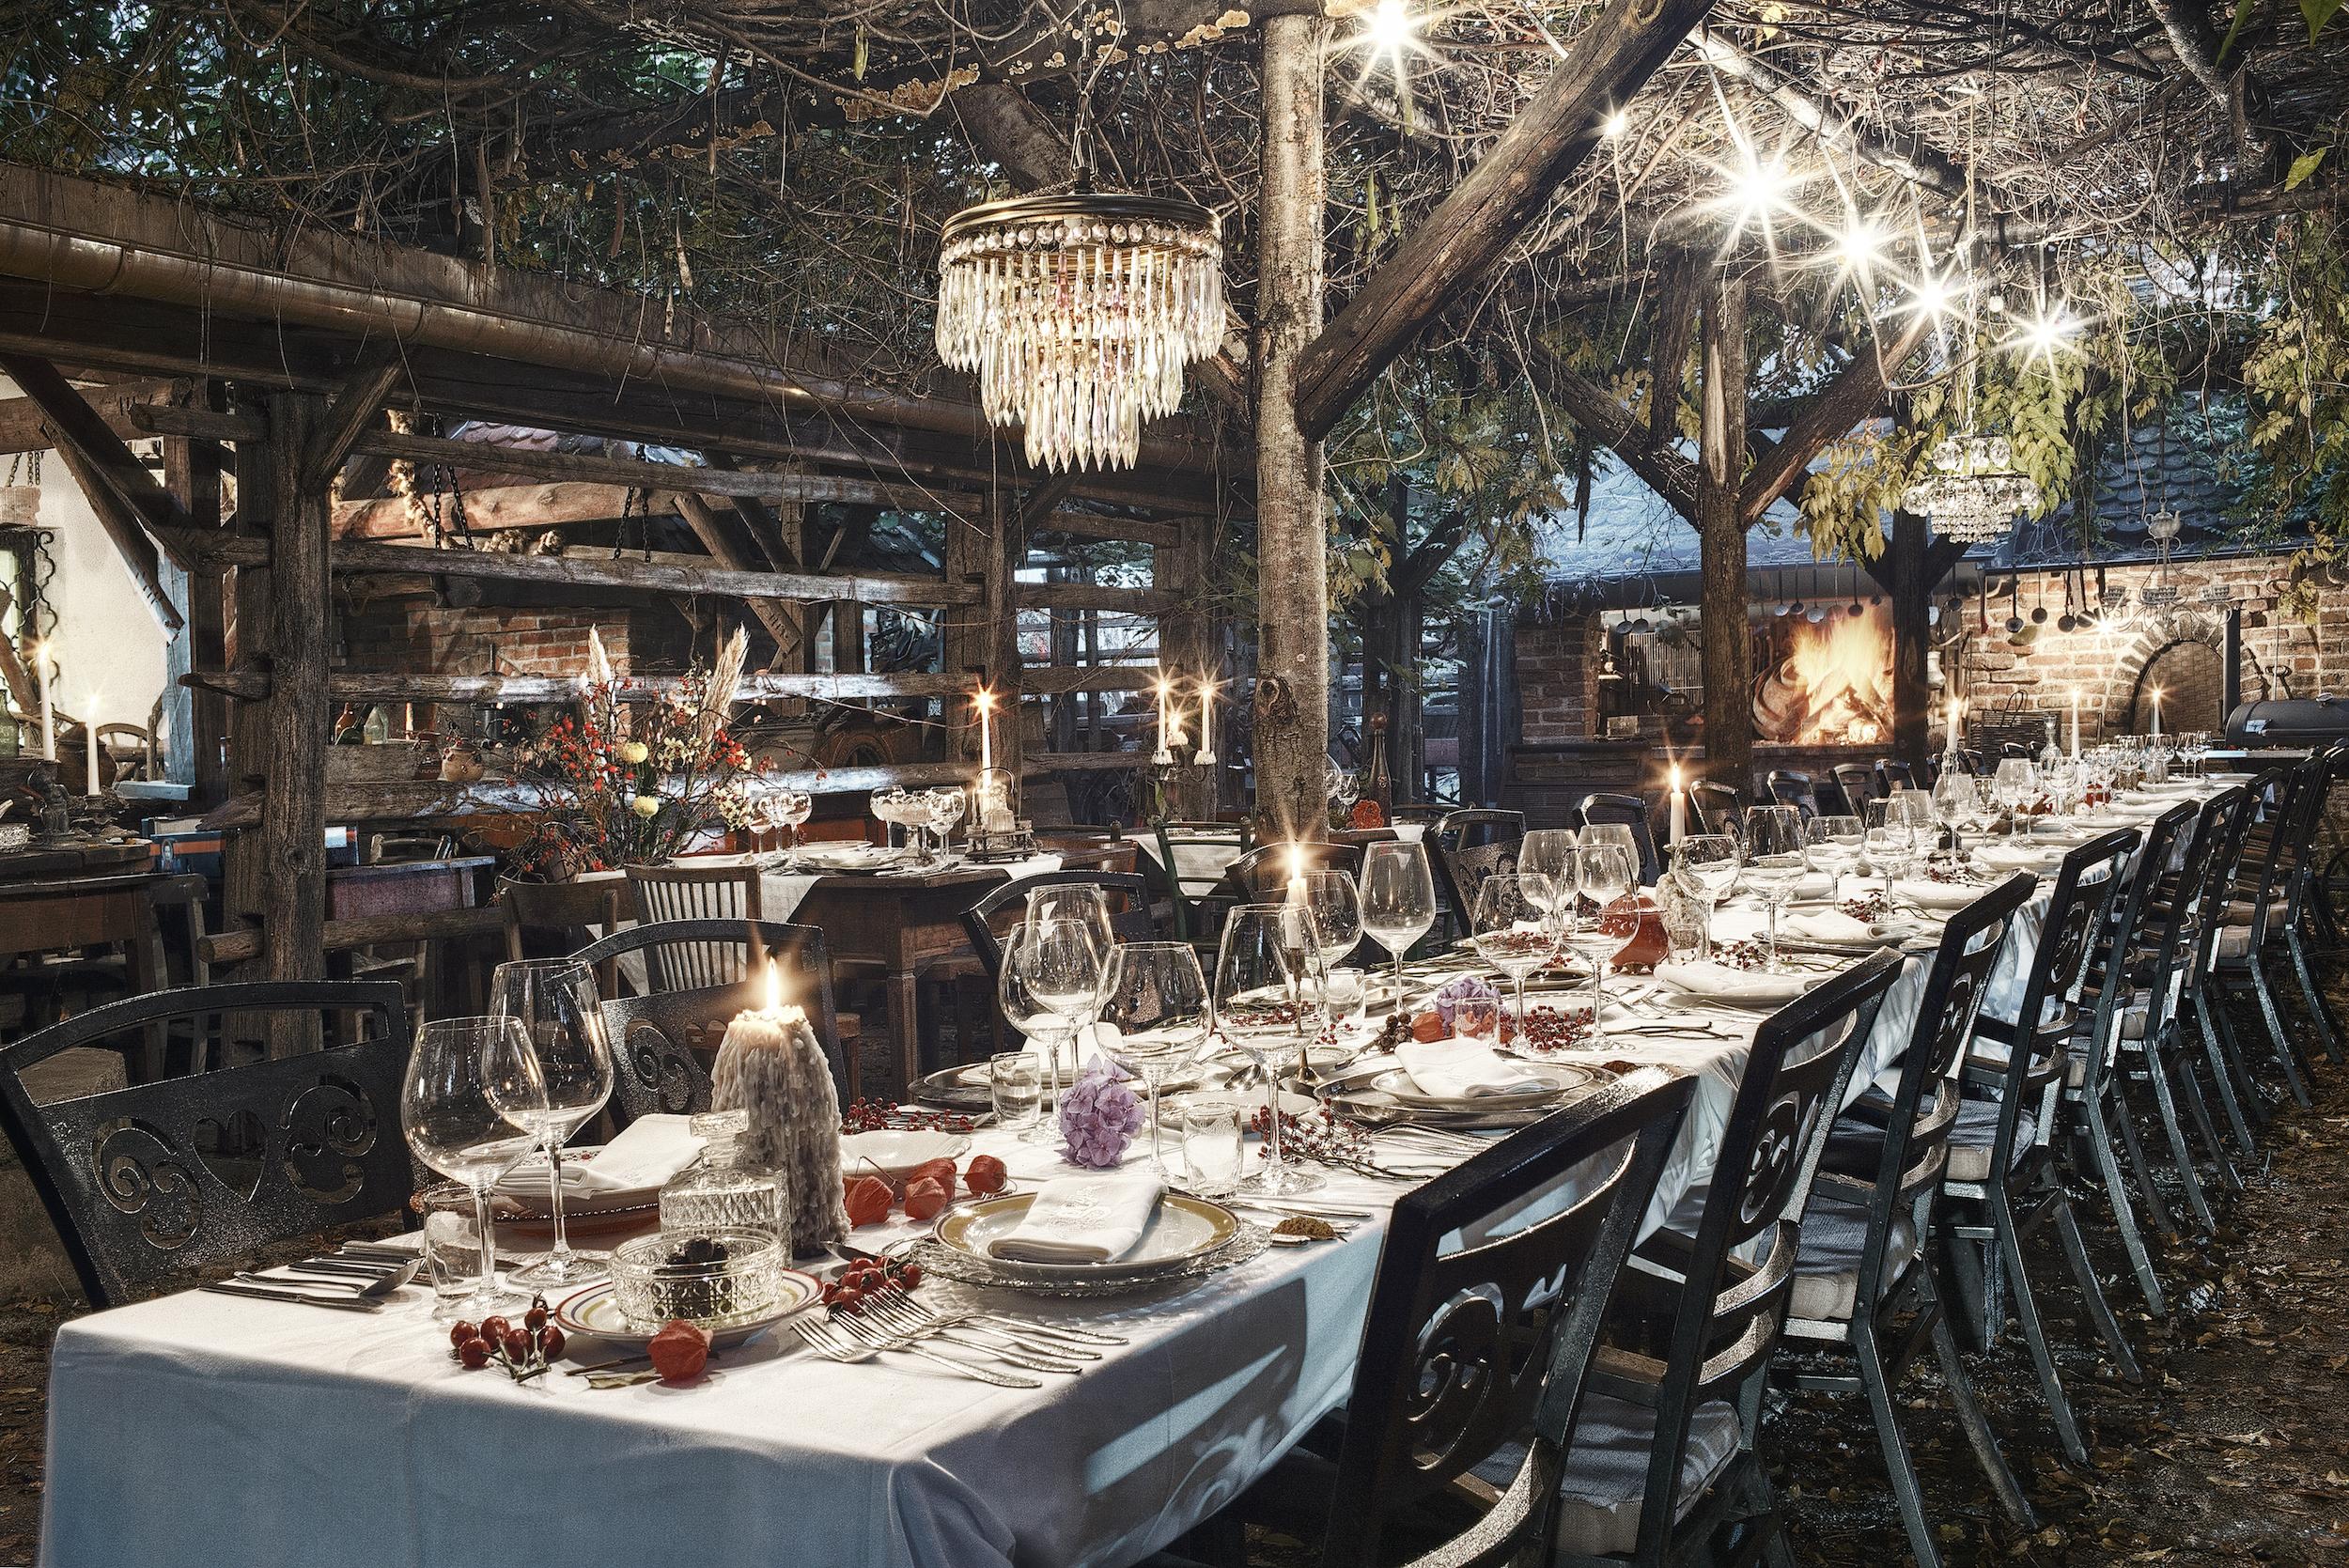 Ana Ros Videos ljubljana, slovenia: best restaurants chosenana ros